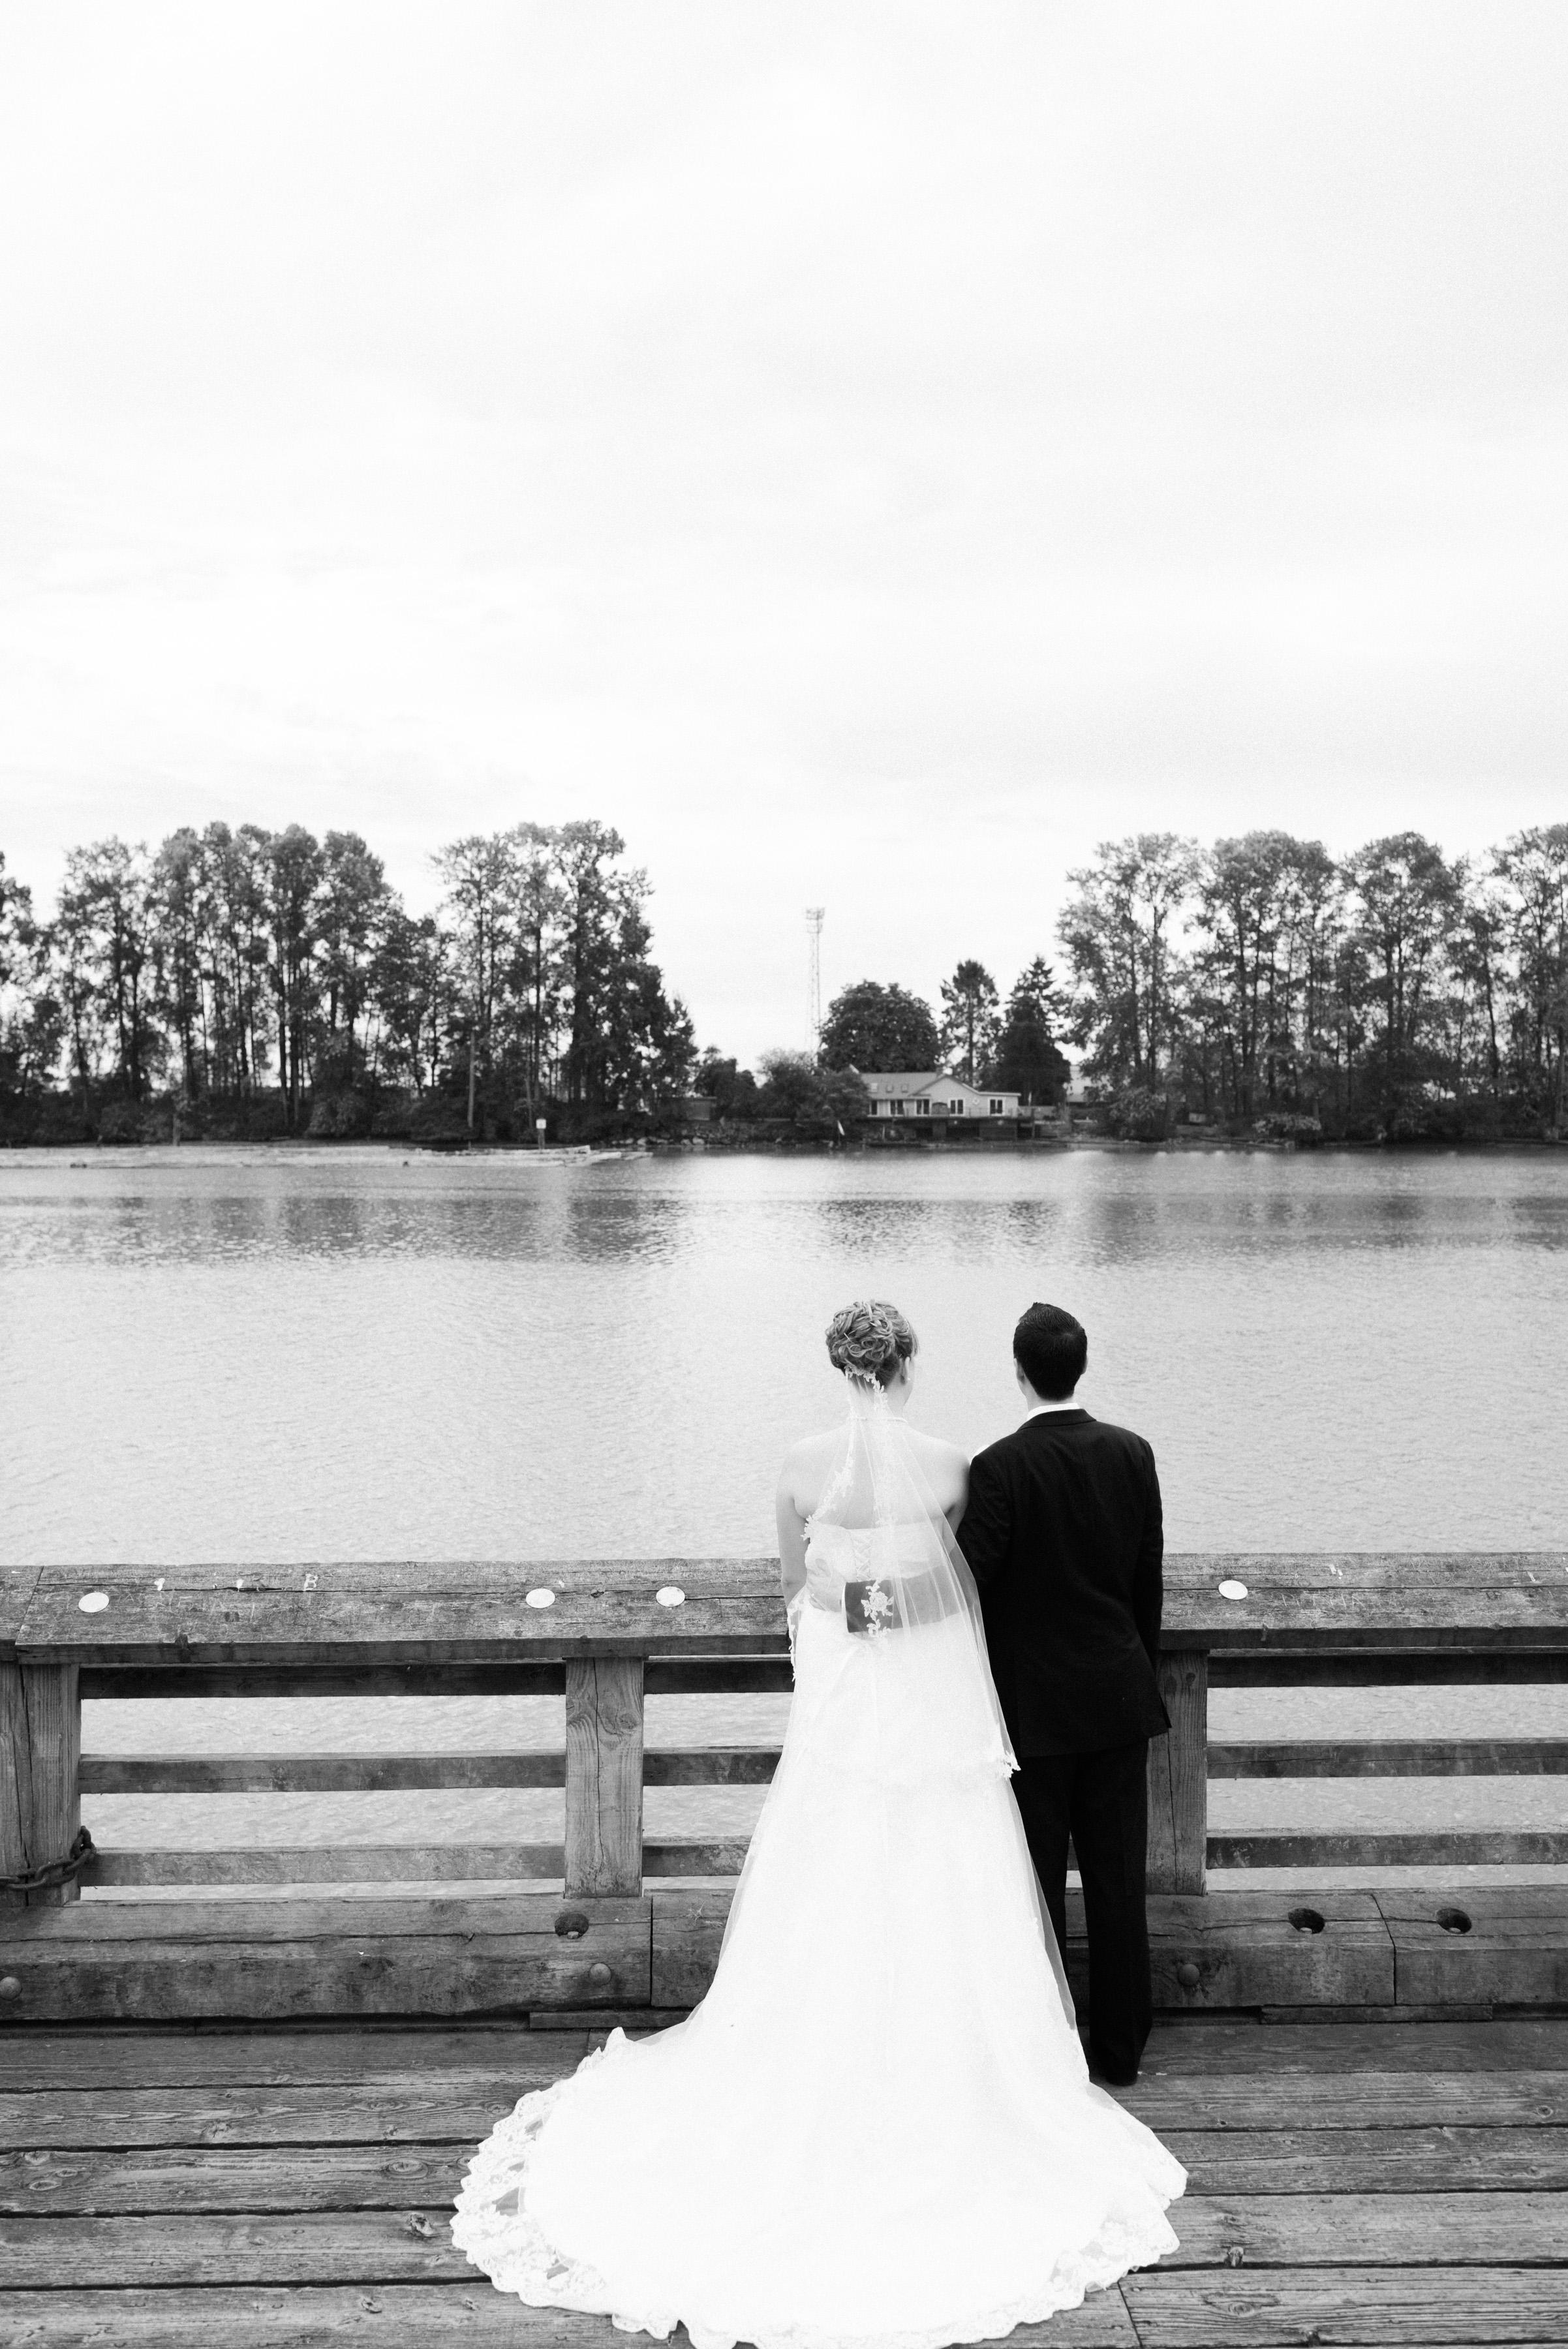 Amanda-rene-wedding-0507-jelger-tanja-photographers.jpg